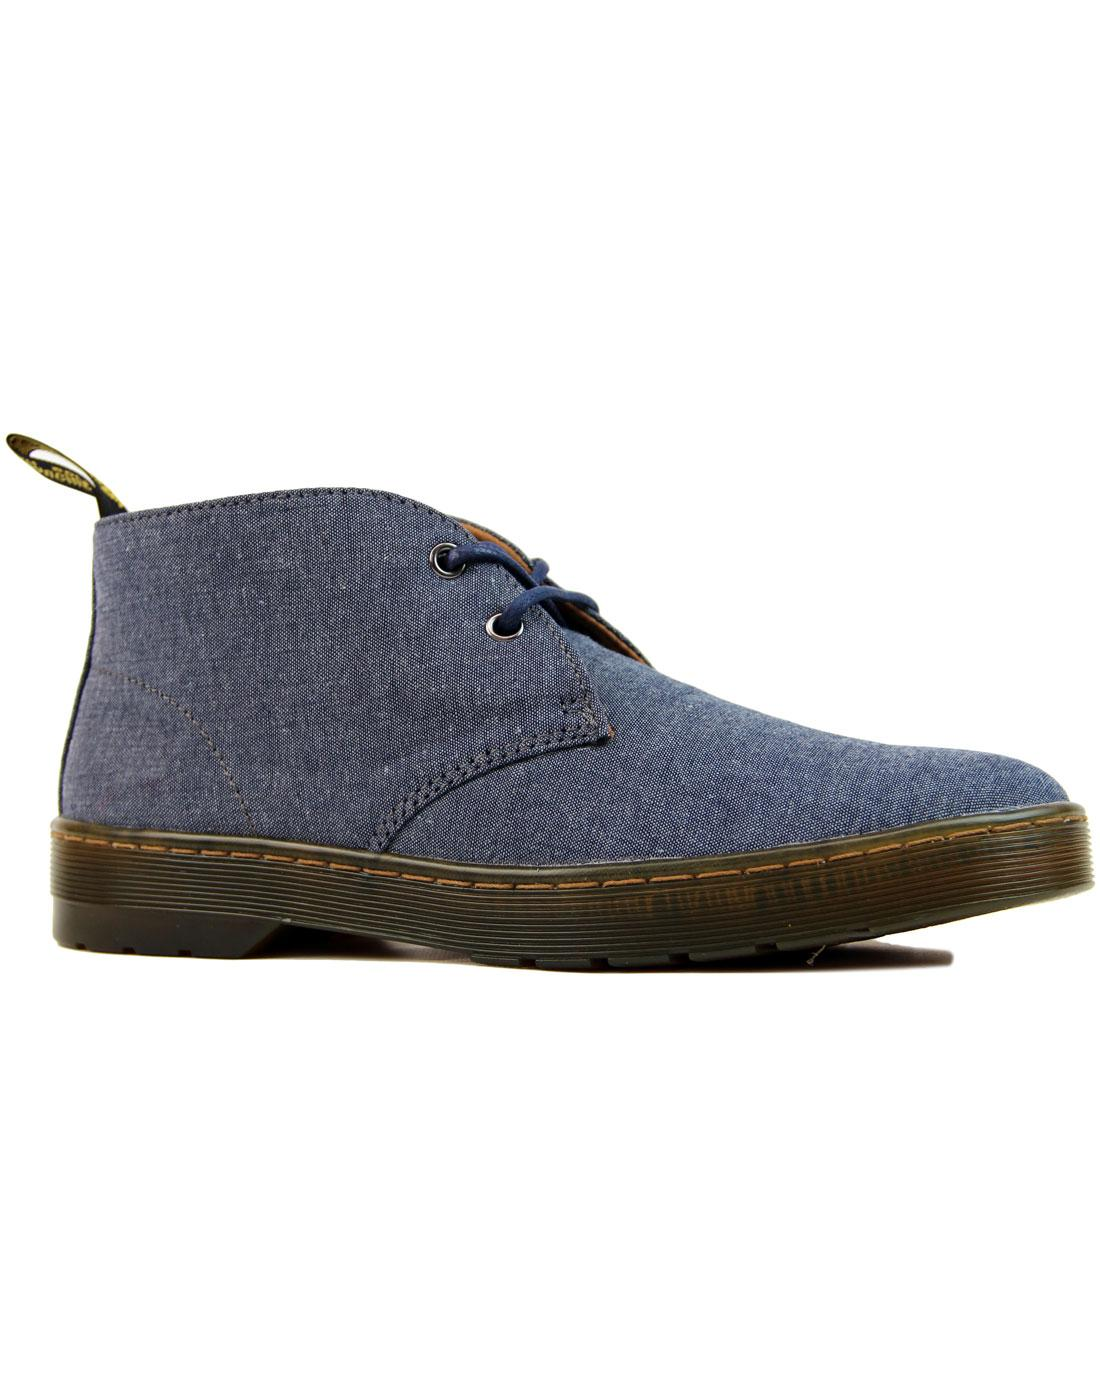 Mayport Chambray Twill DR MARTENS Desert Boots (N)